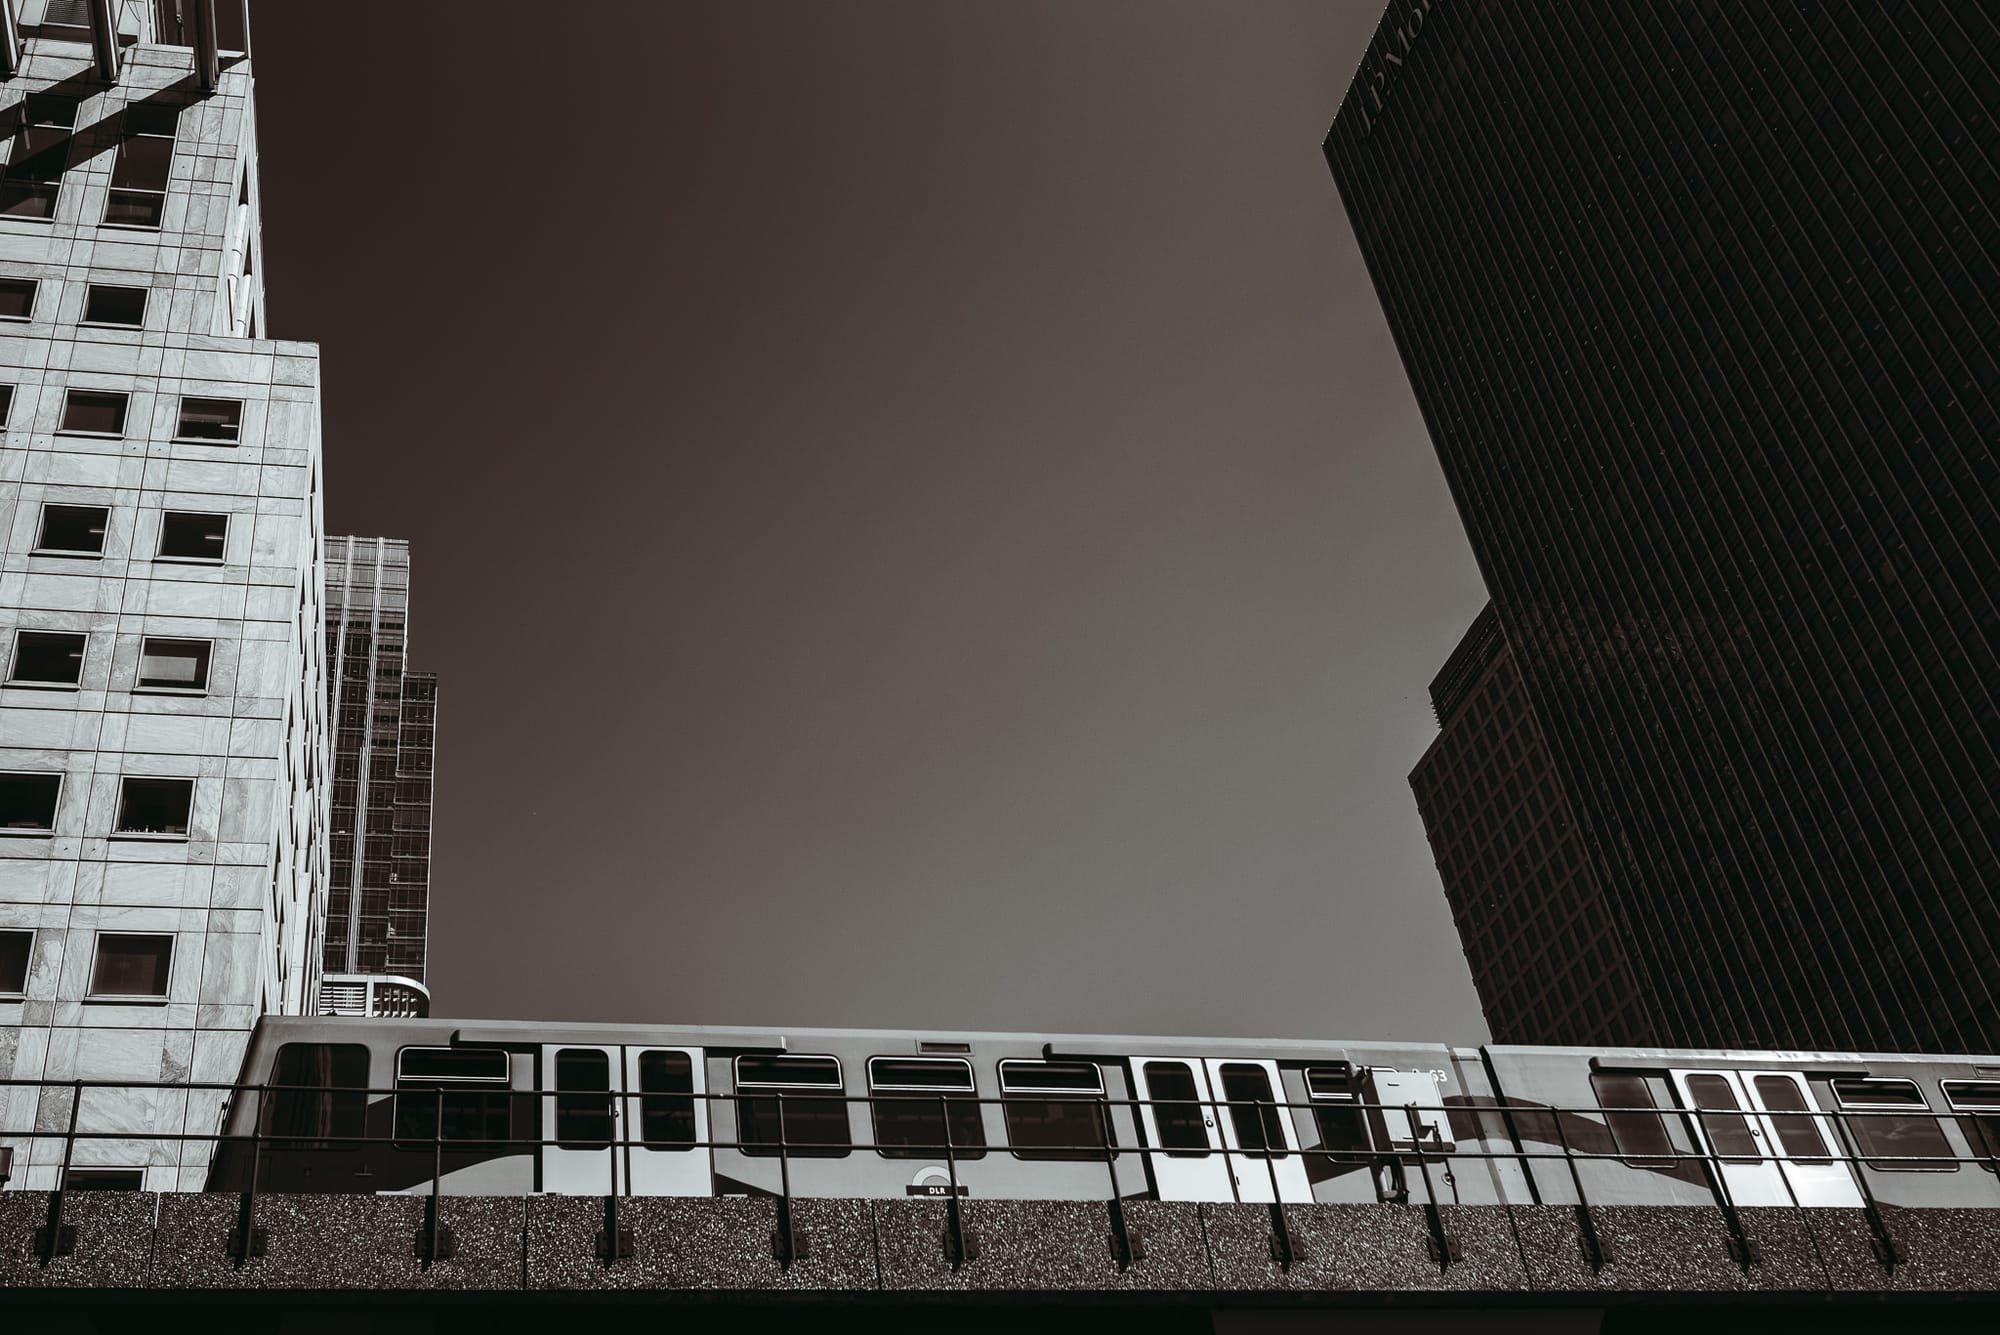 London Architecture & Street